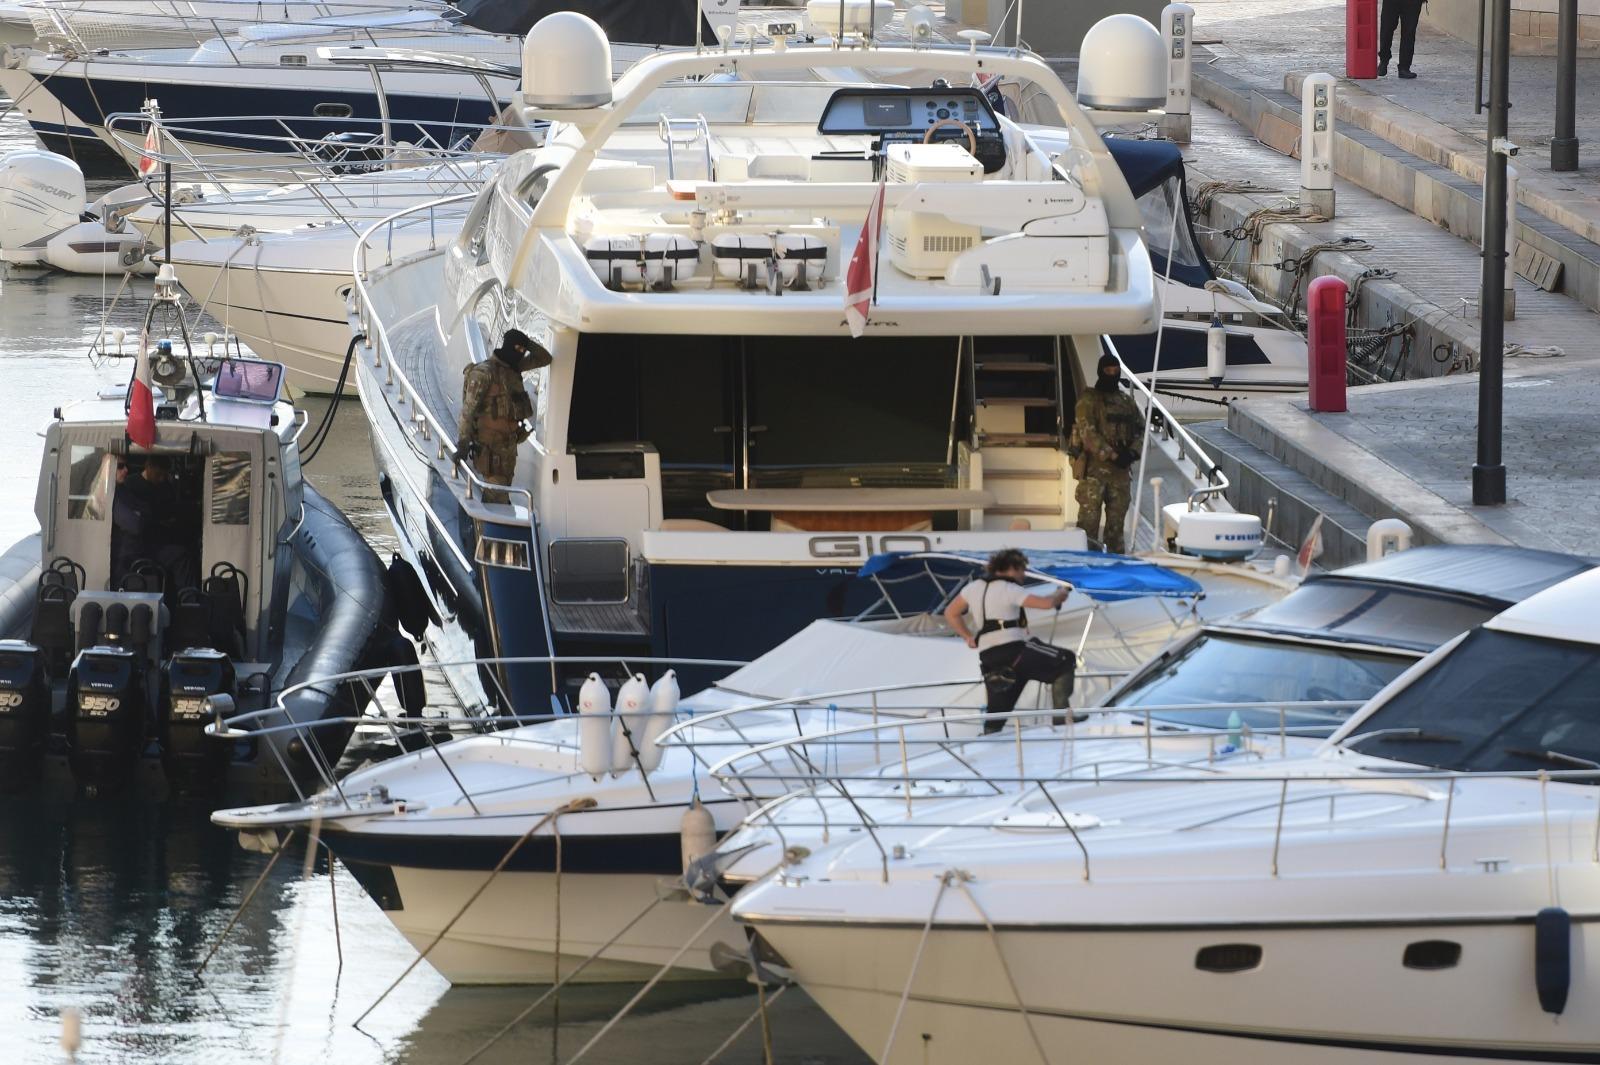 Yorgen Fenech&rsquo;s family yacht <em>Gio</em>. Photo: Jonathan Borg